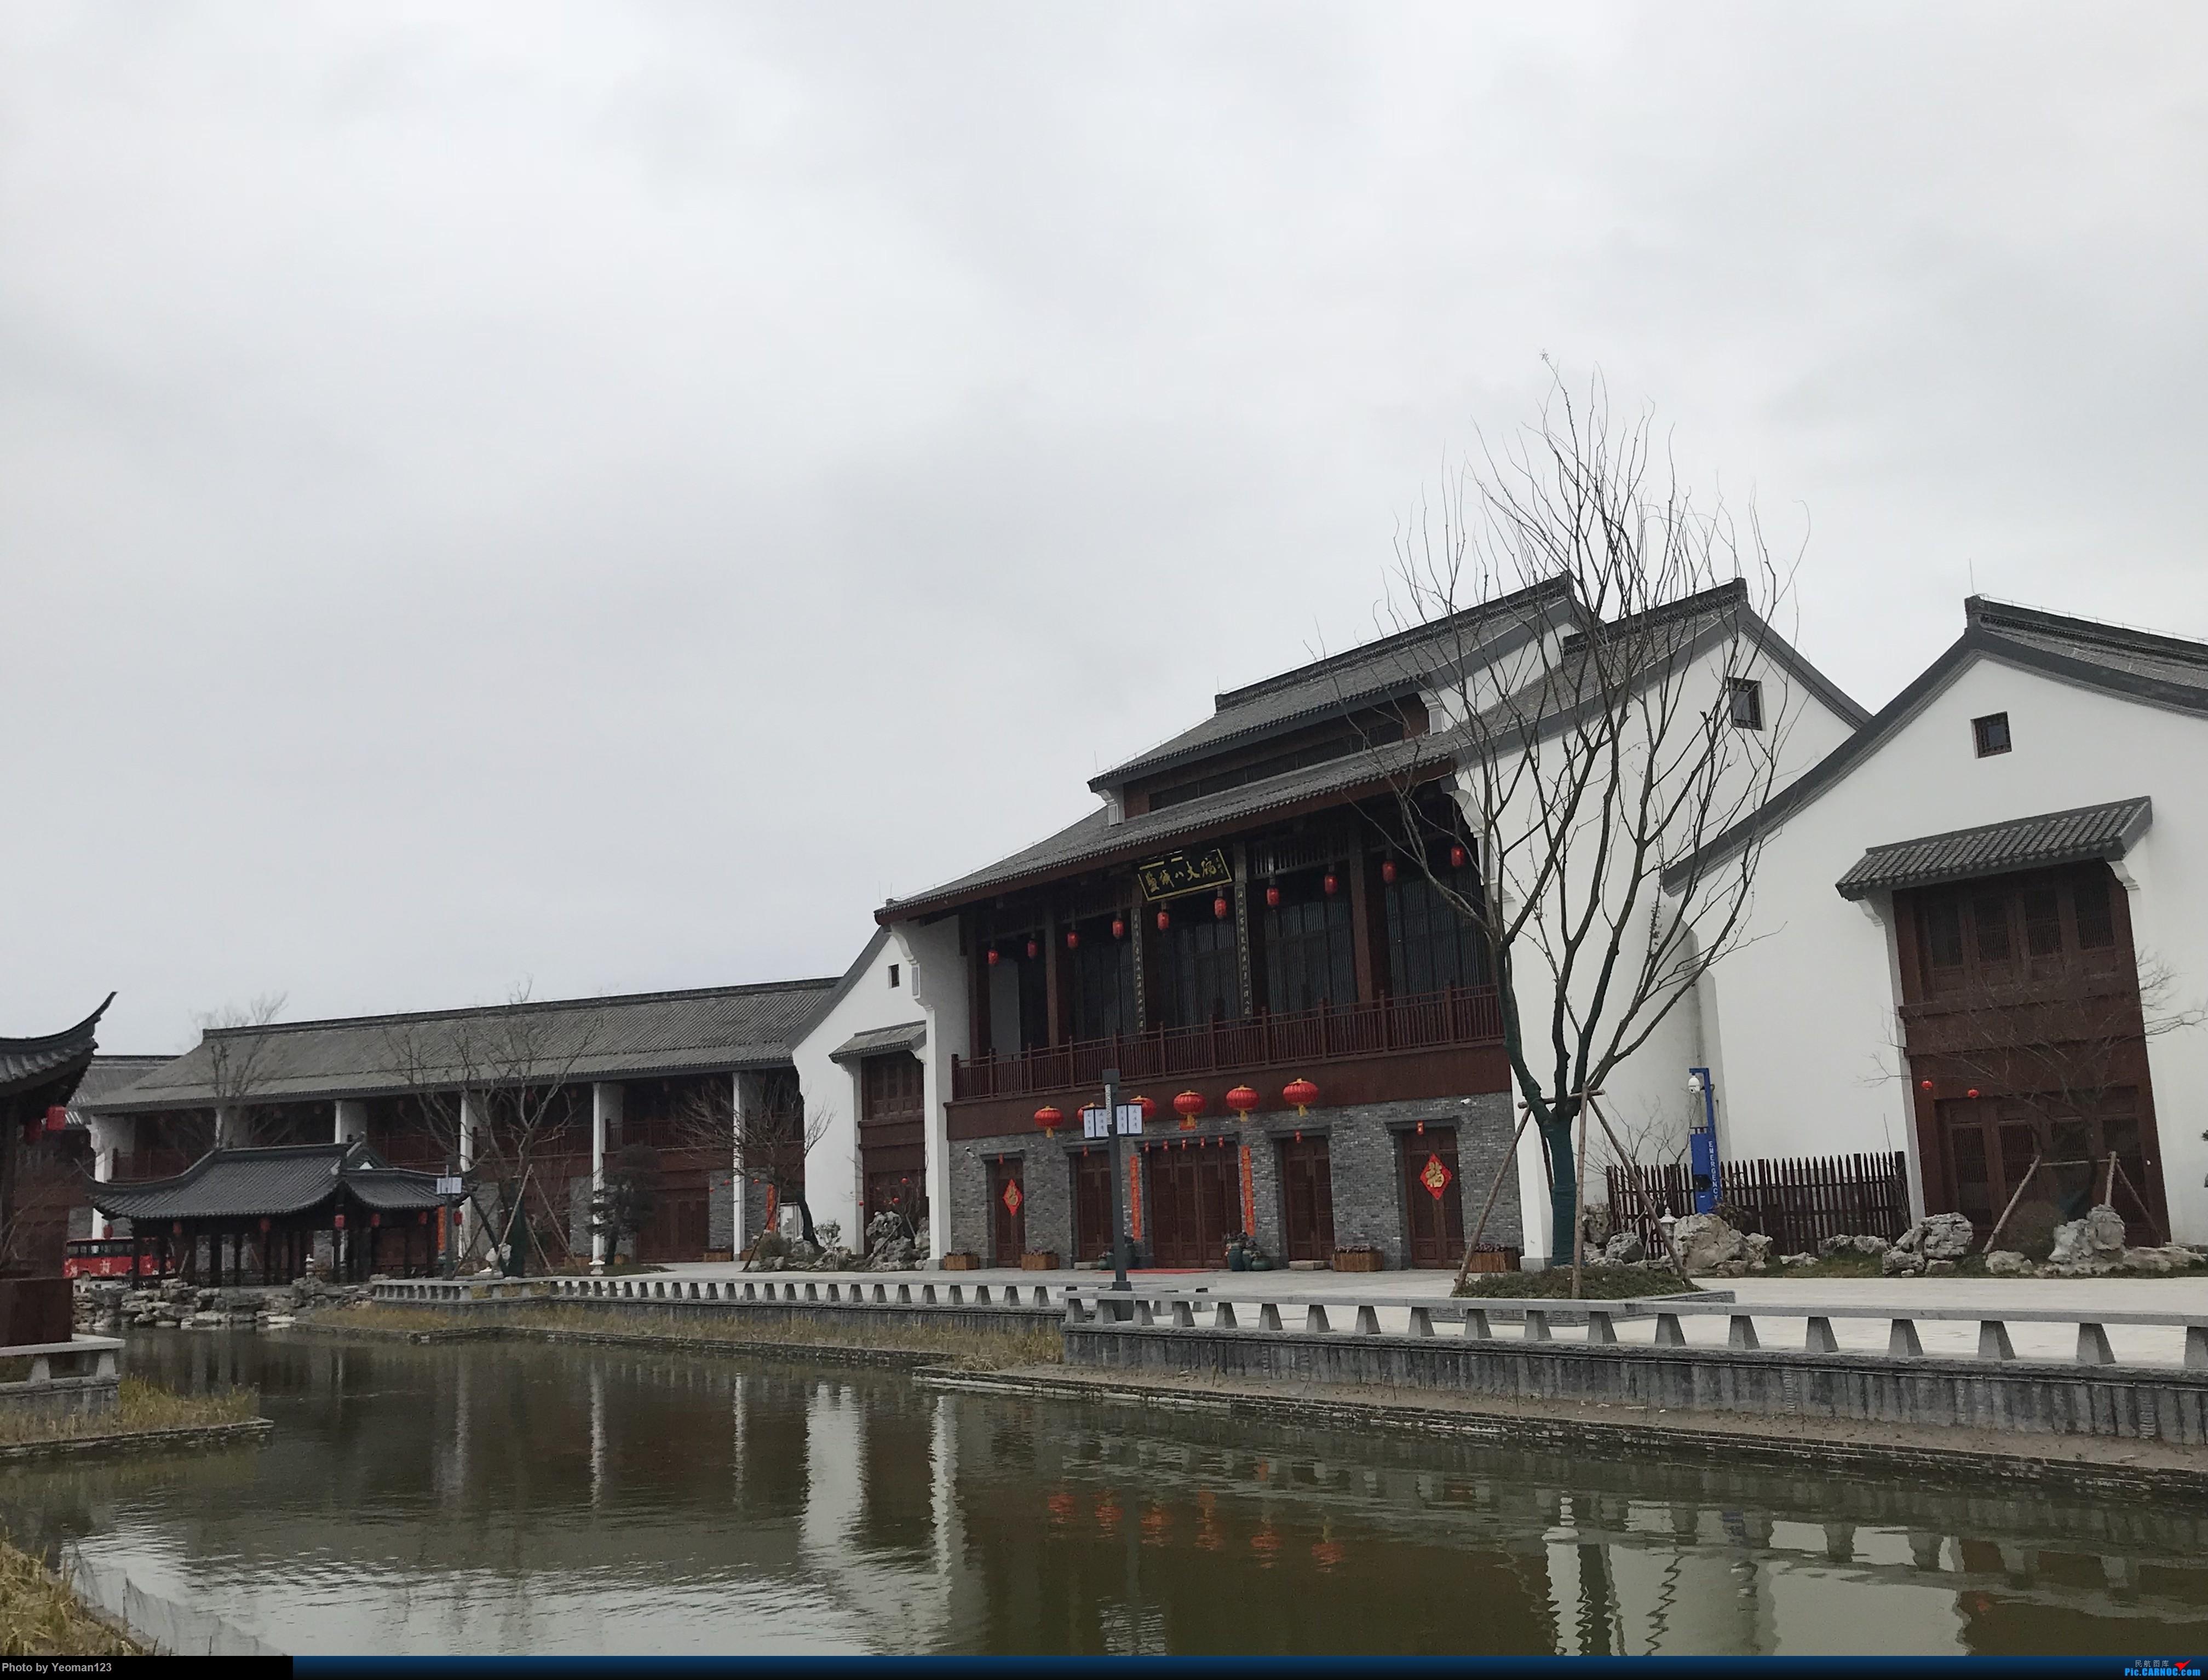 Re:[原创]最短航线(YNZ-SHA)大年初六回上海,苏通大桥太可怕,直接飞回家